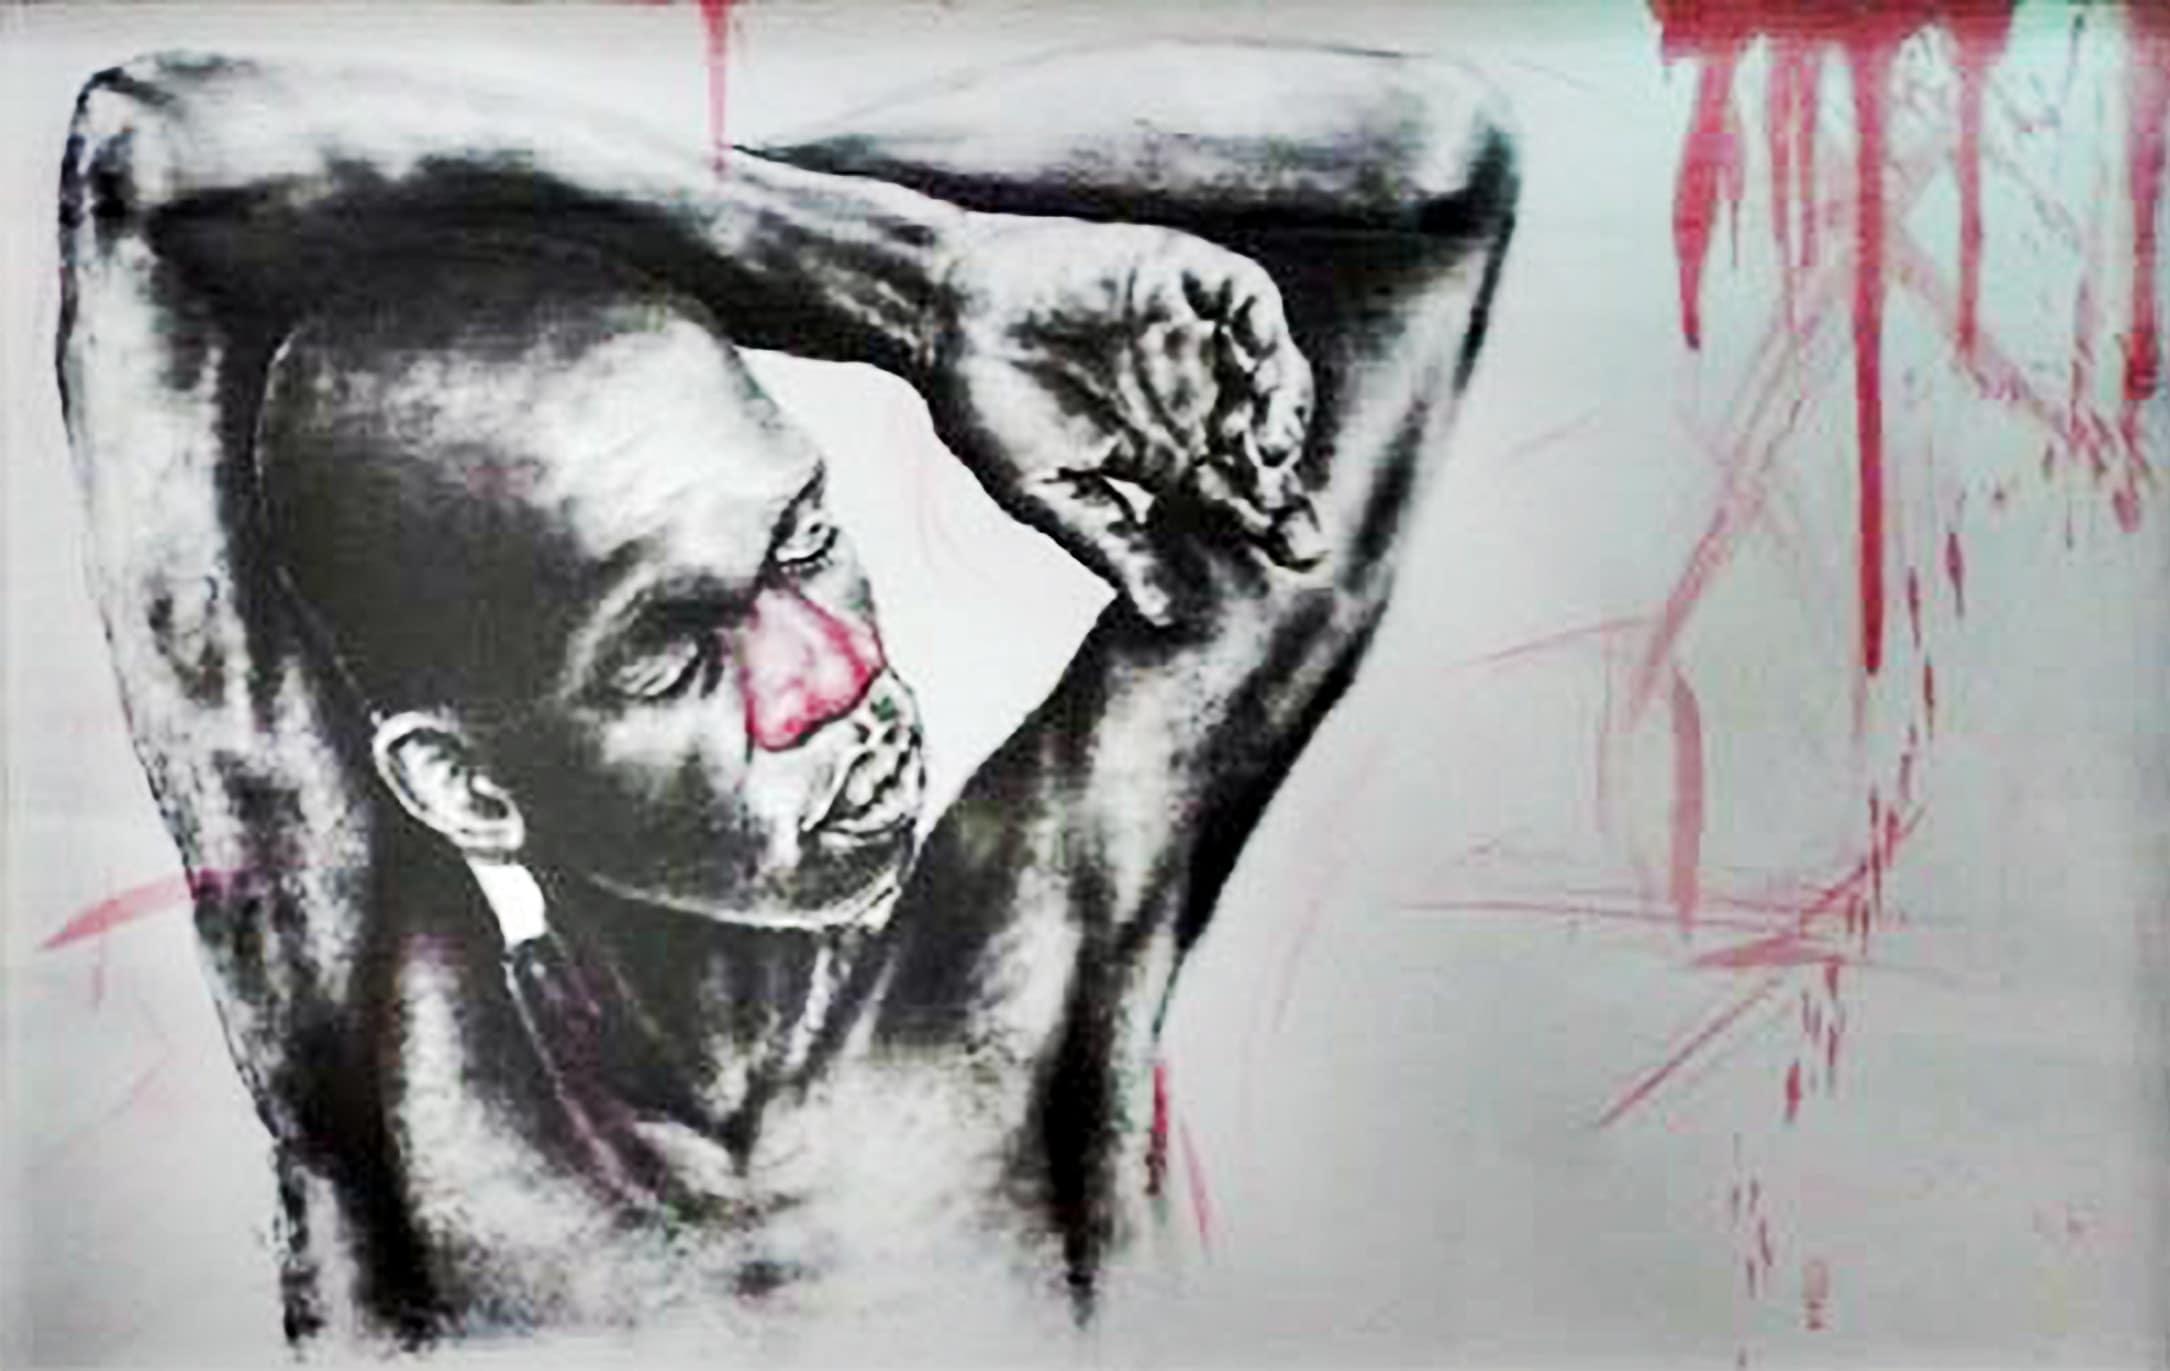 <span class=&#34;link fancybox-details-link&#34;><a href=&#34;/artists/89-mlamuli-mkhwanazi/works/3154-mlamuli-mkhwanazi-isithunywa-sendlozi-2015/&#34;>View Detail Page</a></span><div class=&#34;artist&#34;><strong>Mlamuli Mkhwanazi</strong></div> <div class=&#34;title&#34;><em>Isithunywa Sendlozi</em>, 2015</div> <div class=&#34;medium&#34;>Charcoal & Ink On Paper</div> <div class=&#34;dimensions&#34;>83cm x 121cm</div><div class=&#34;price&#34;>R11,800.00</div>